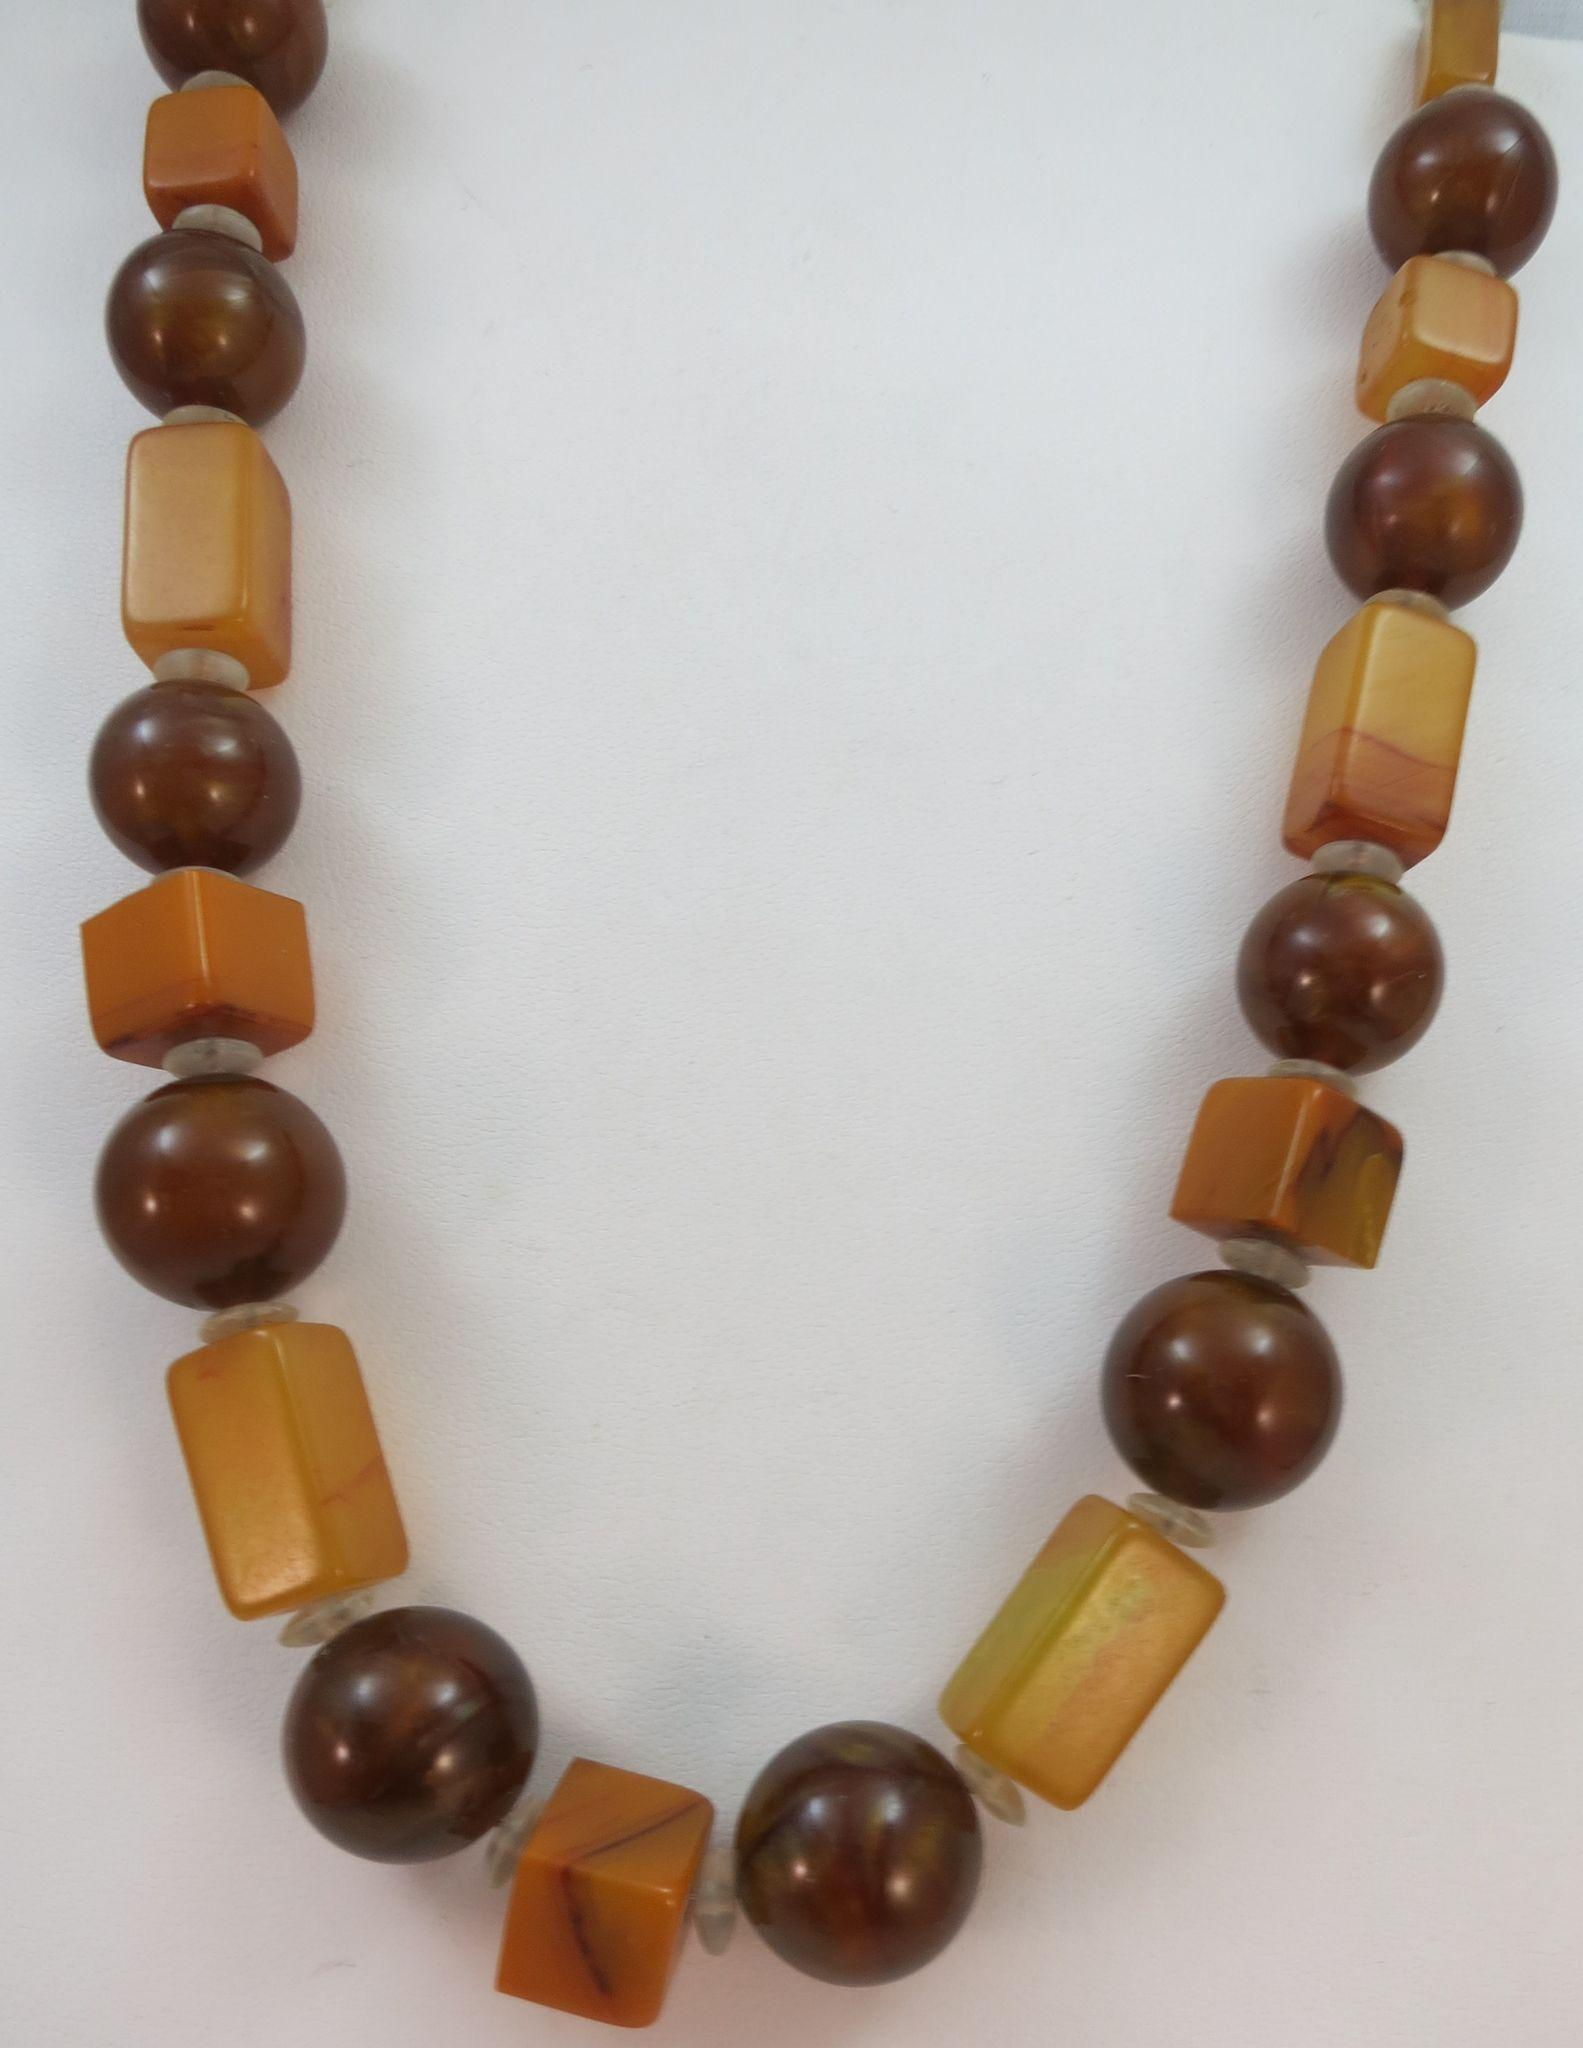 VINTAGE Necklace with Bakelite Squares  Professional restrung